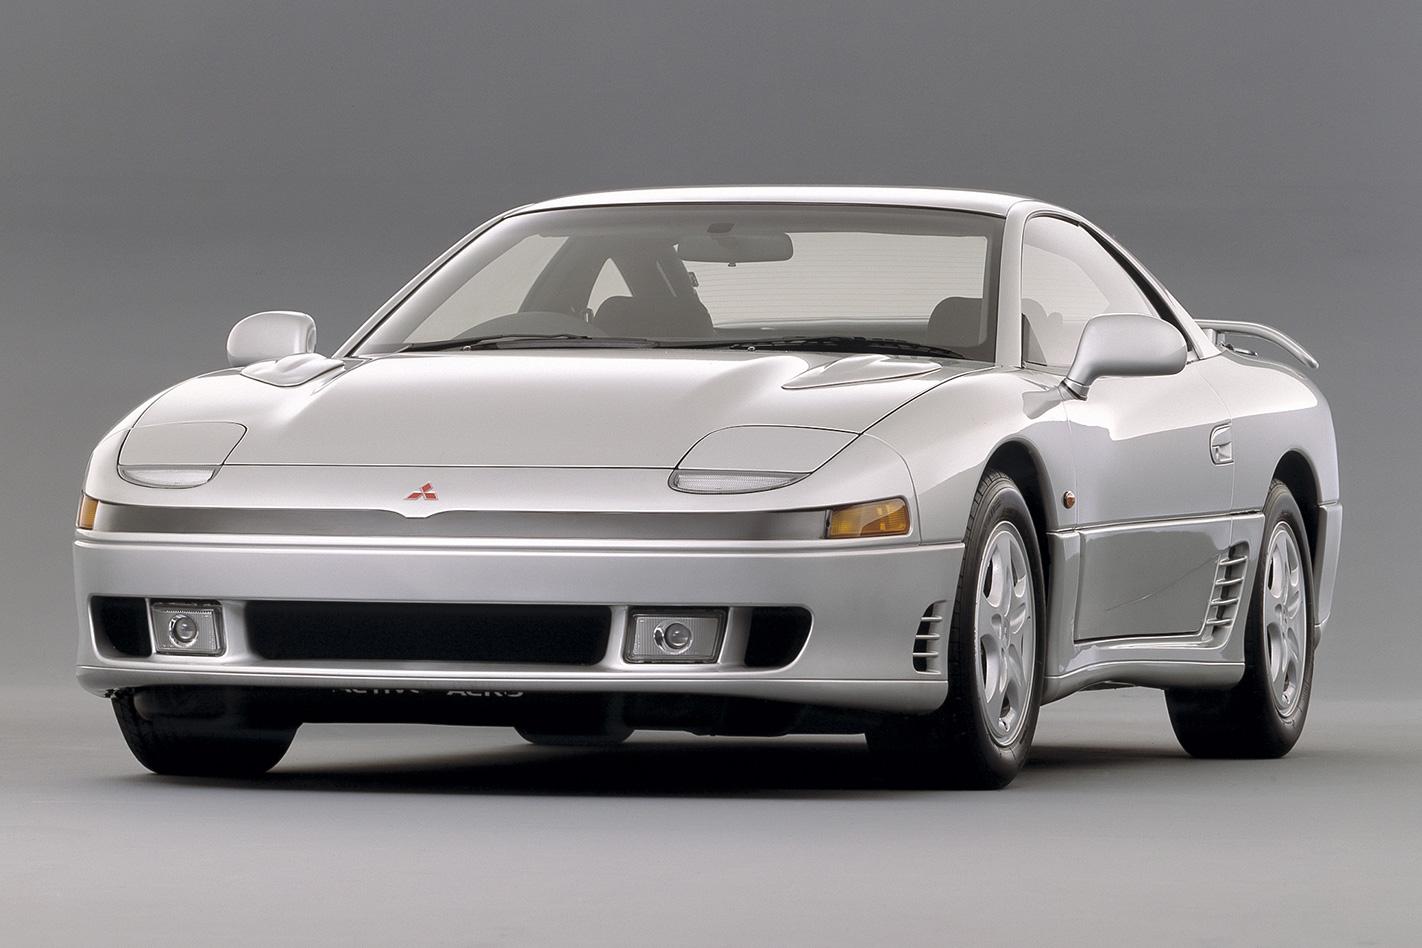 mitsubishi 3000gt: fast car history lesson